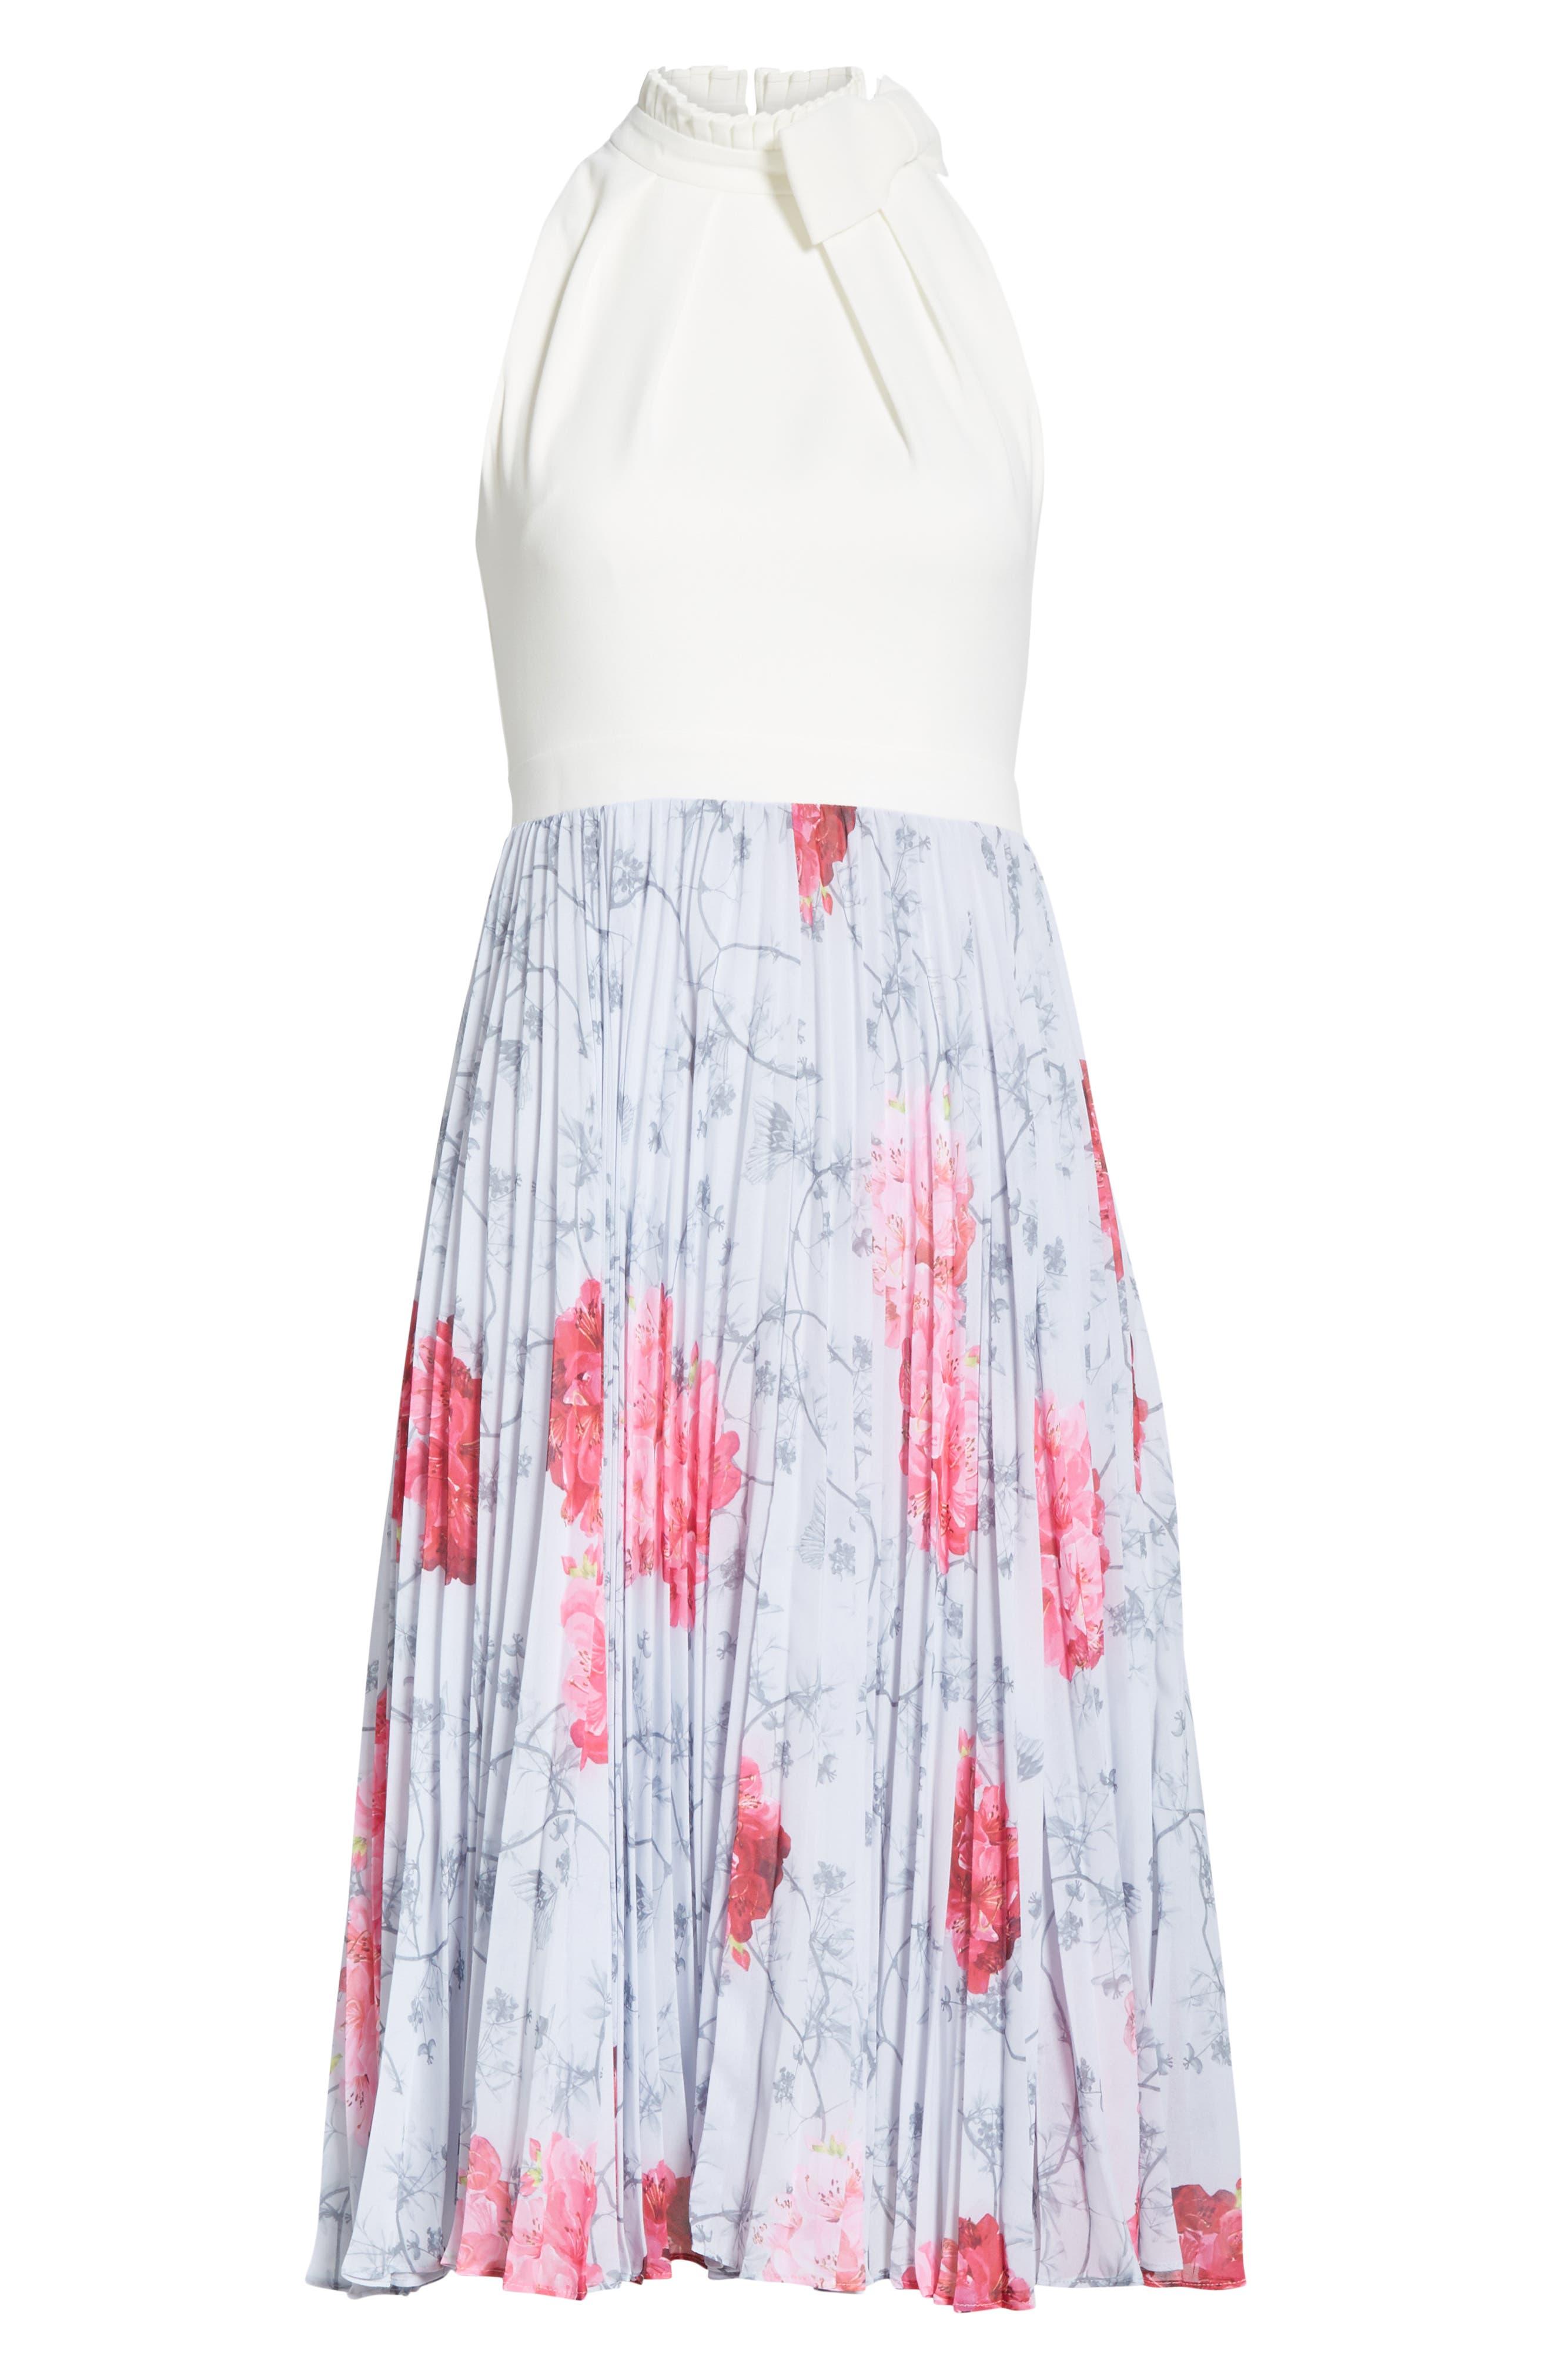 Babylon Pleat A-Line Dress,                             Alternate thumbnail 6, color,                             GREY